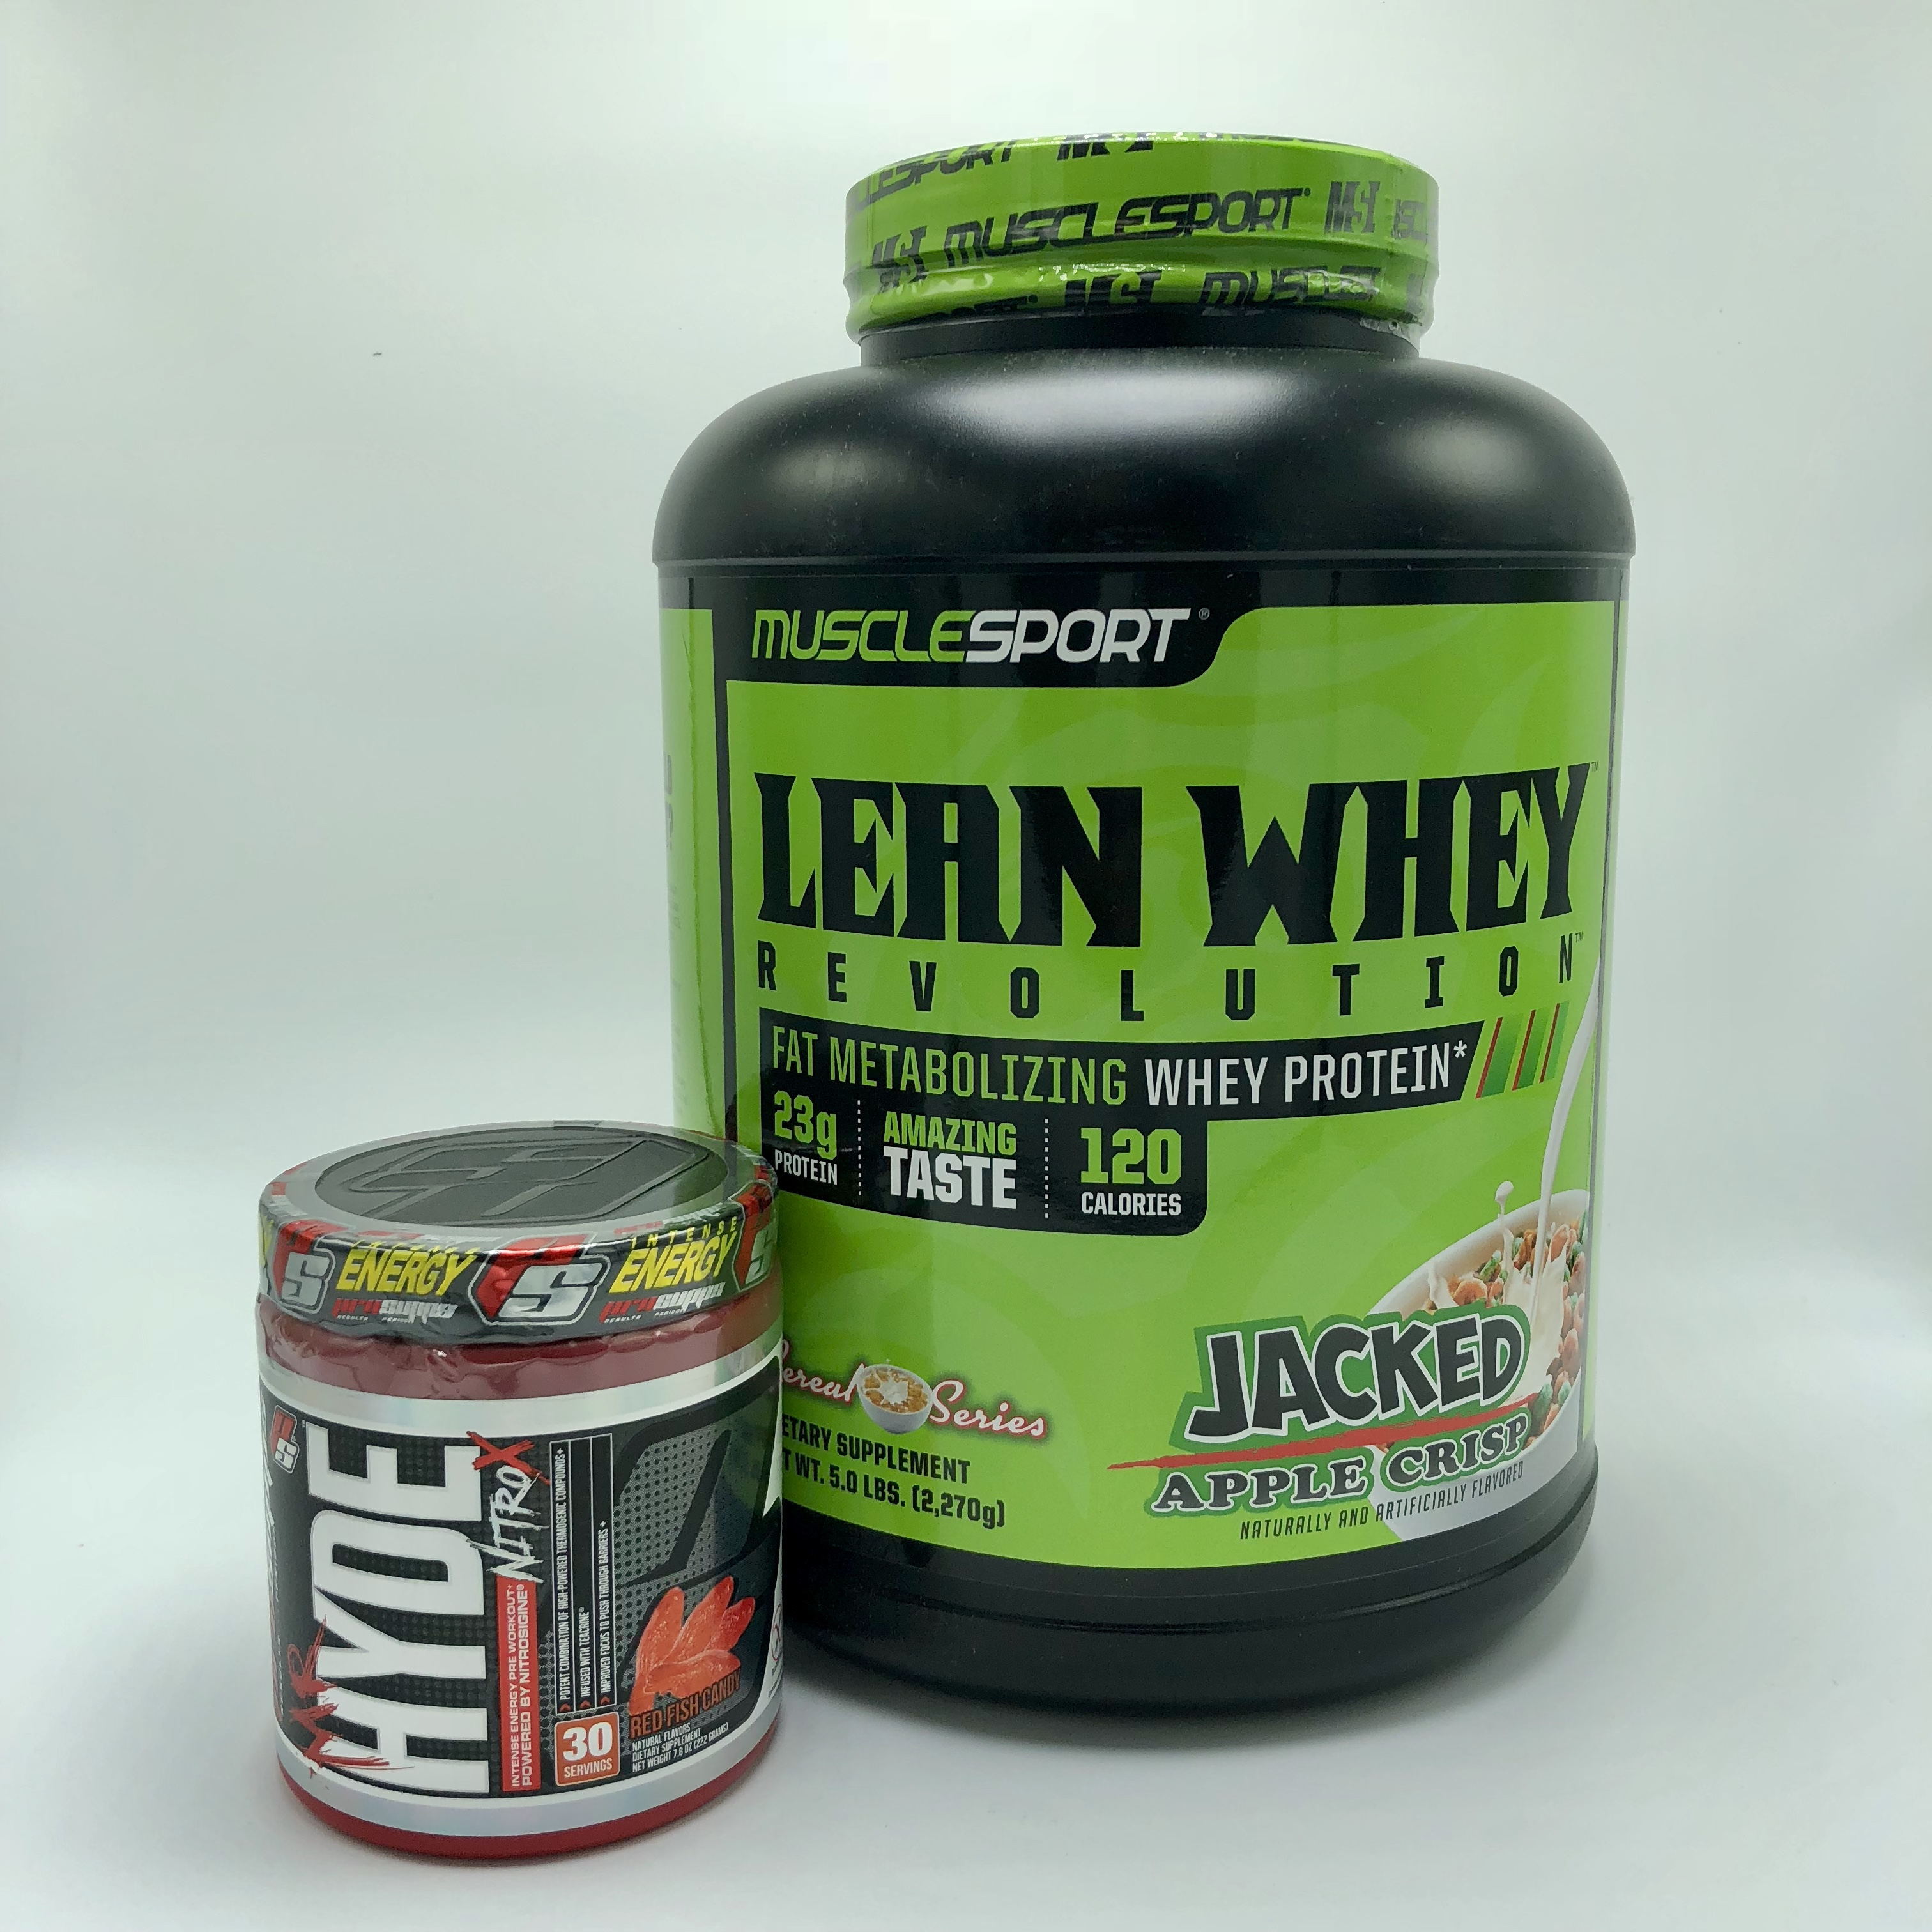 Muscle Sport Lean Whey Pro Supps Mr. Hyde Nitro